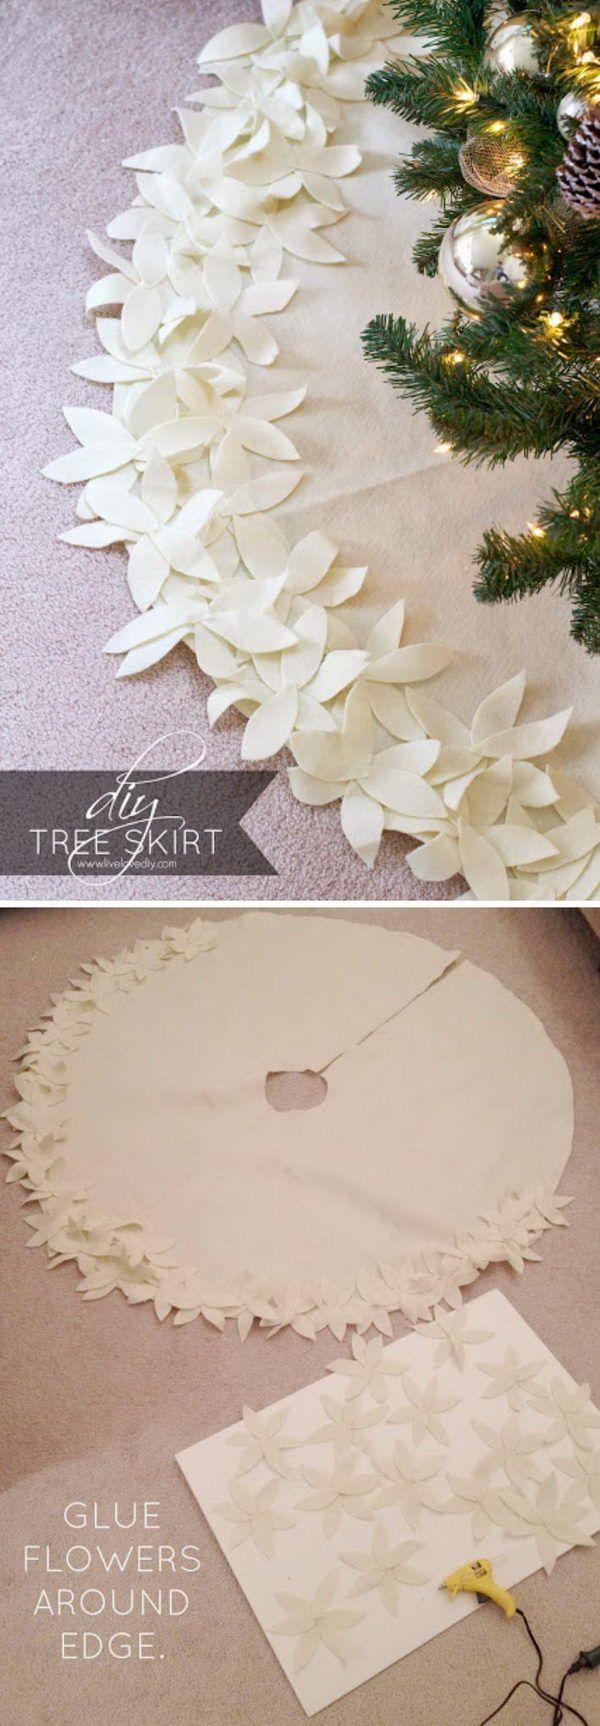 DIY NO SEW Christmas Tree Skirt With Felt Flowers.